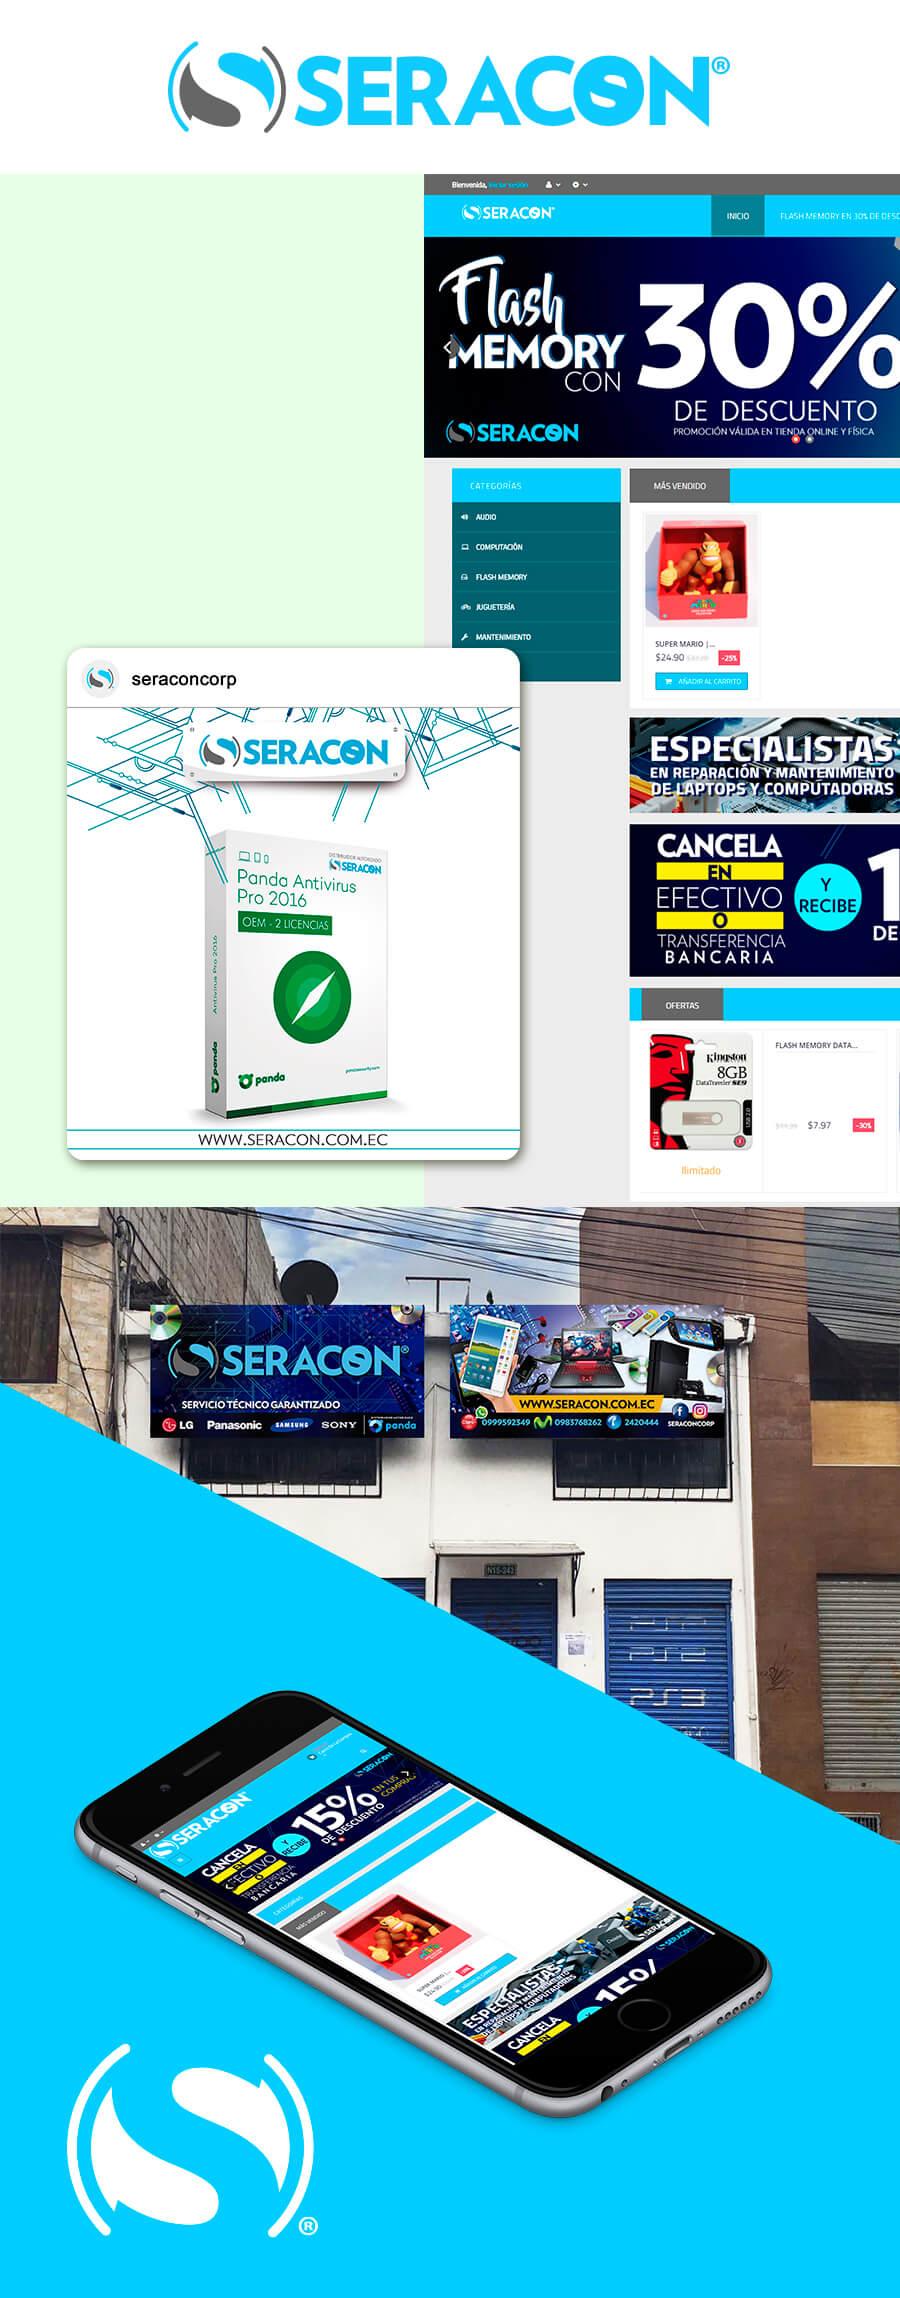 83pixeles | Seracon | Diseño Web Adaptativo en Ecuador | eCommerce